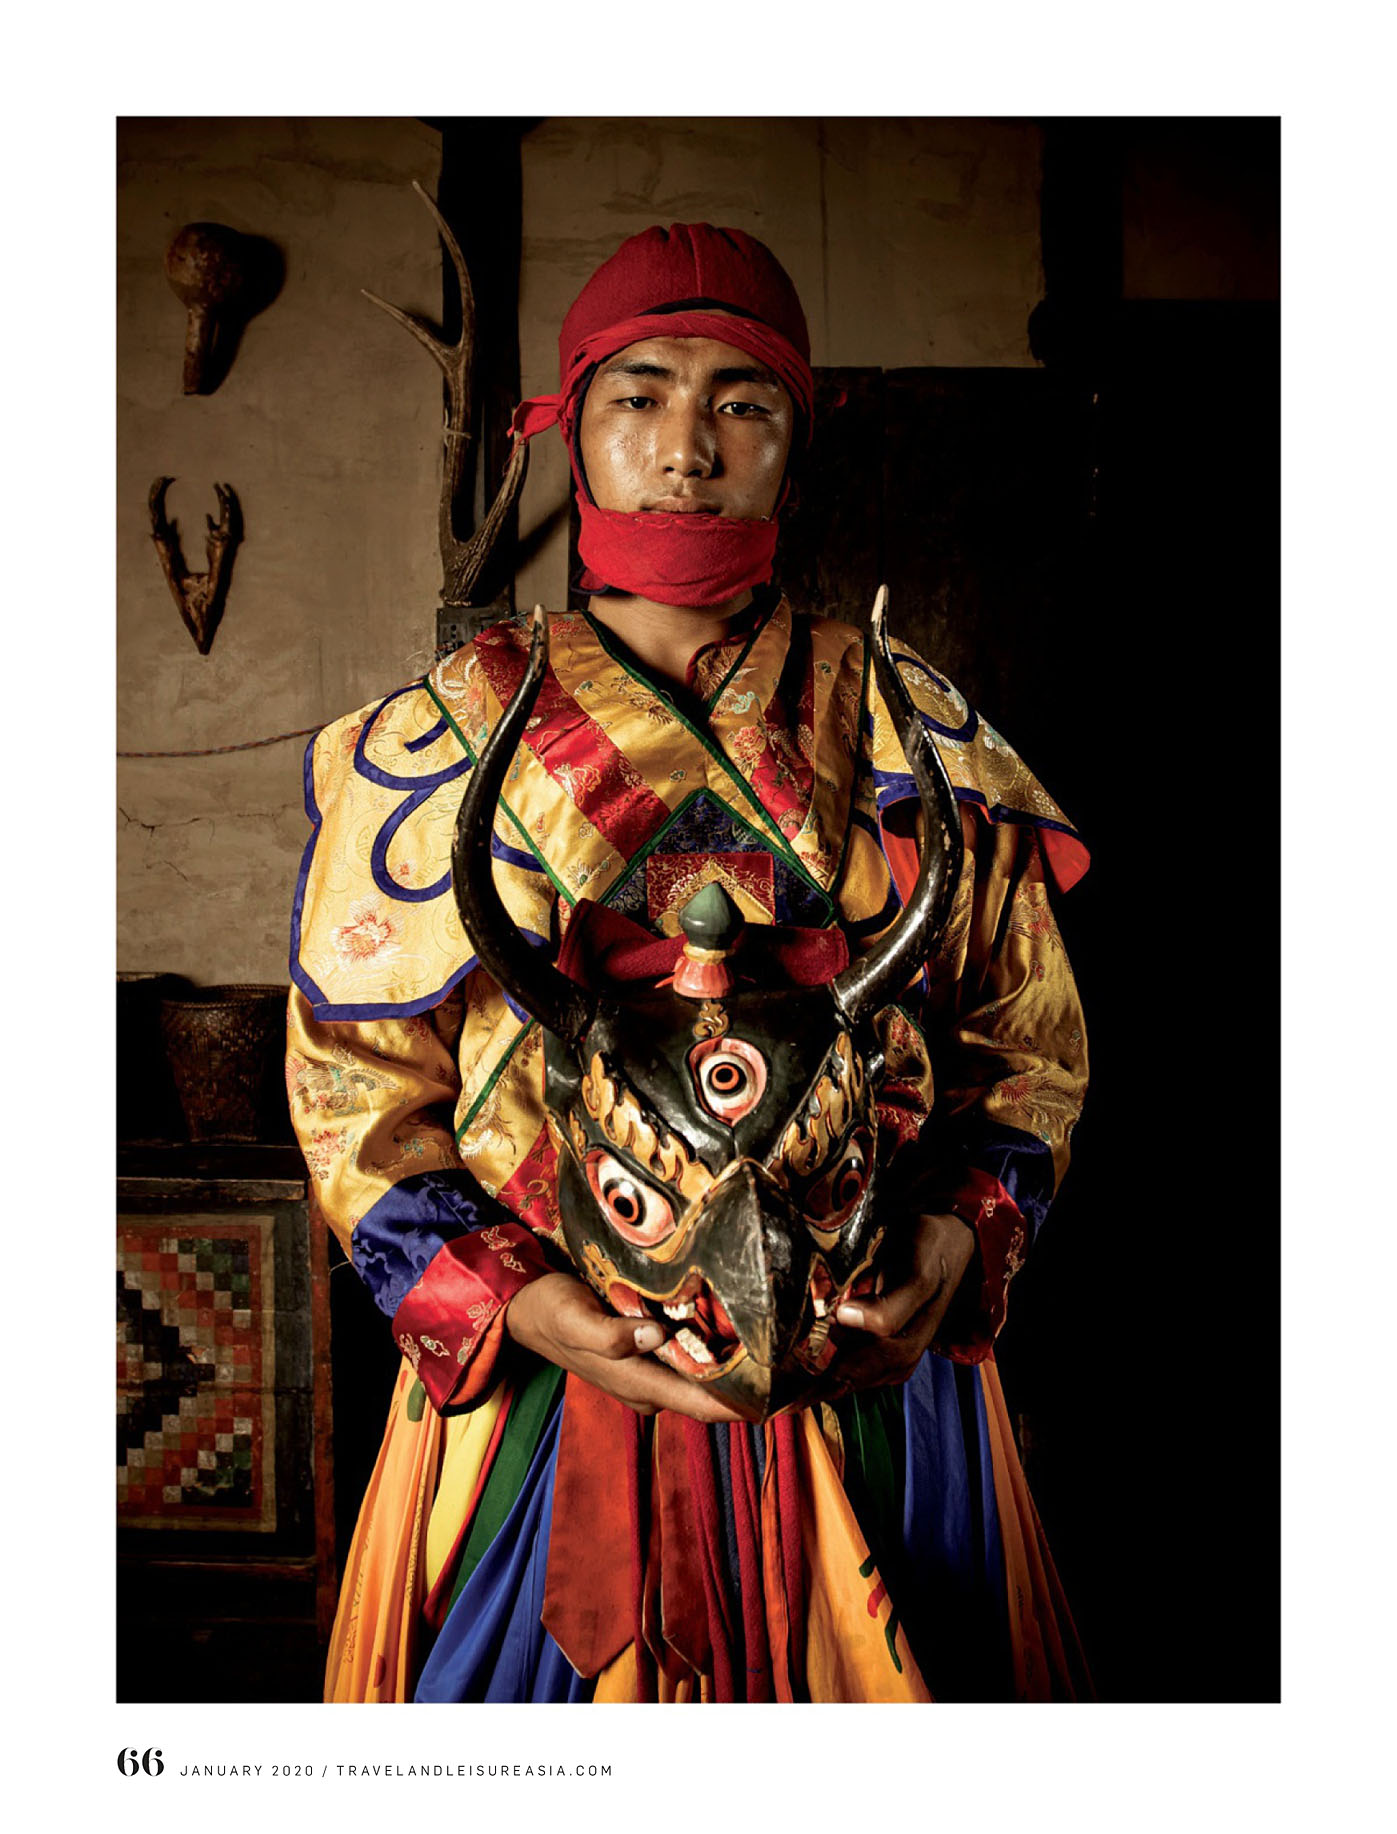 Travel & Leisure SE Asia 2020-01 Bhutan-1.jpg